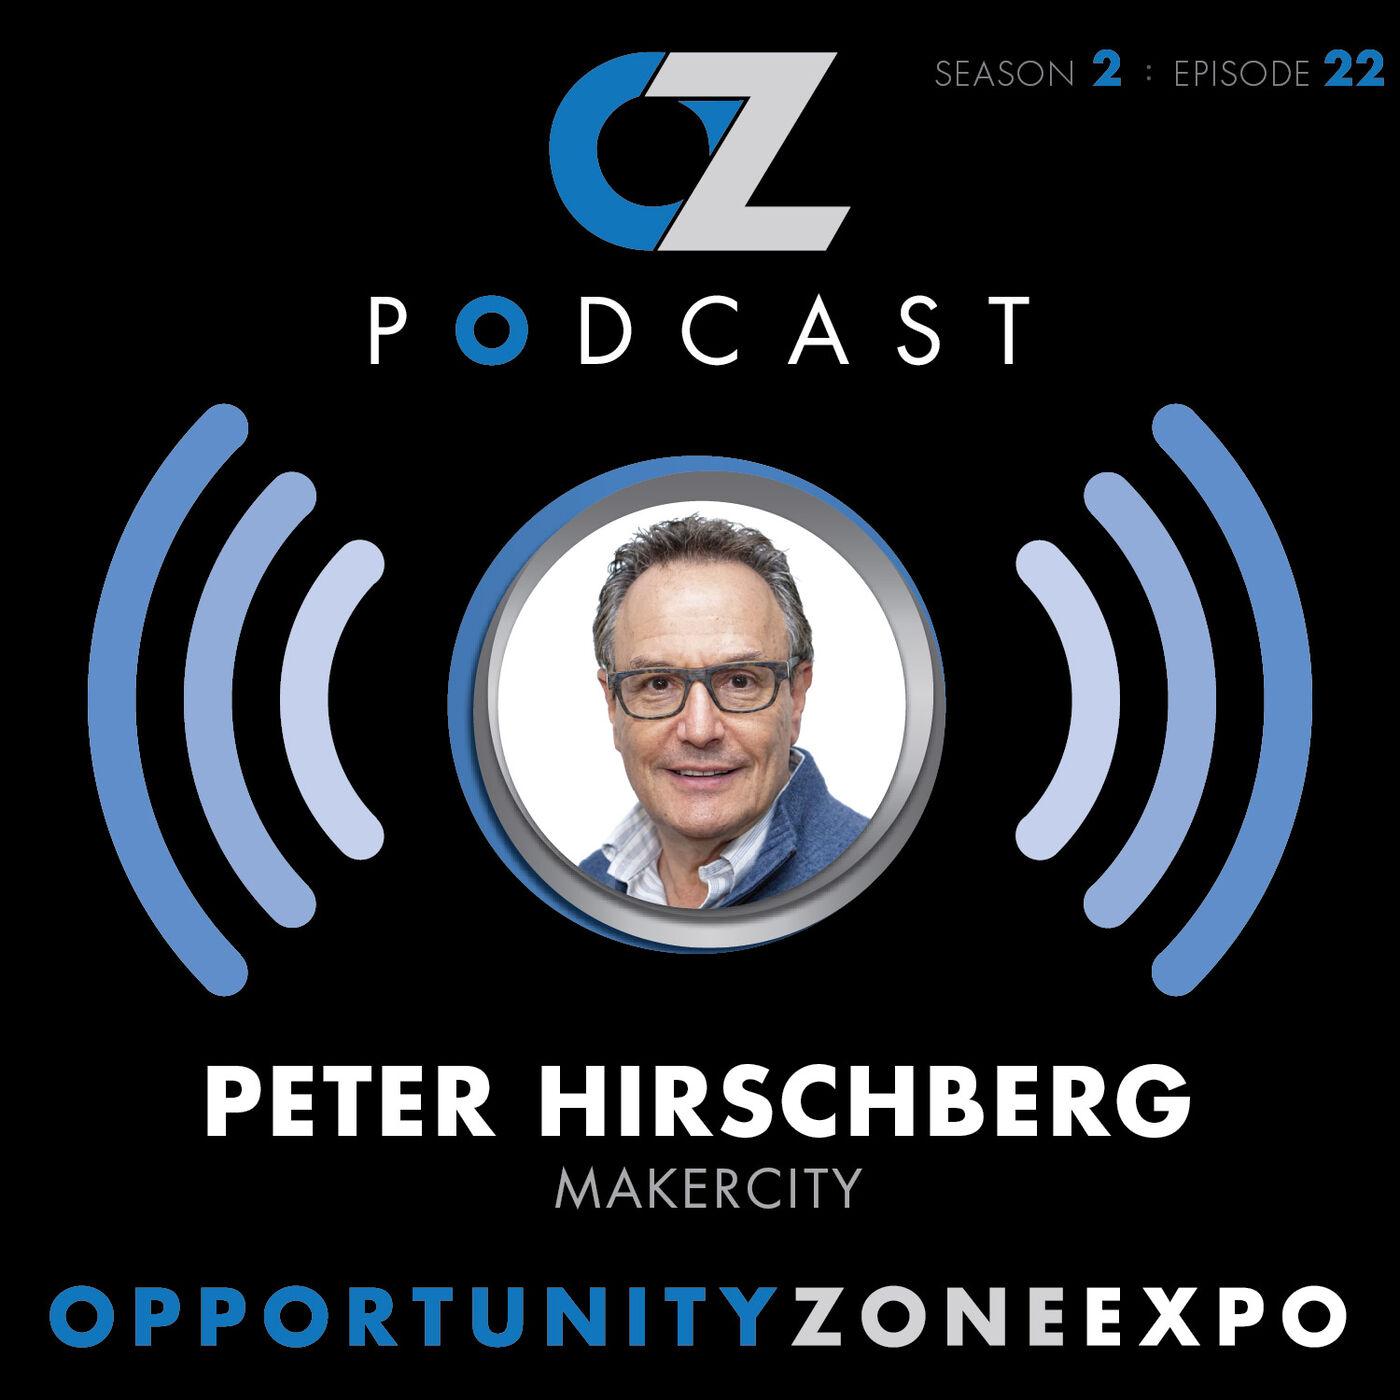 Peter Hirshberg - Let's Treat Our Cities as Development Platforms